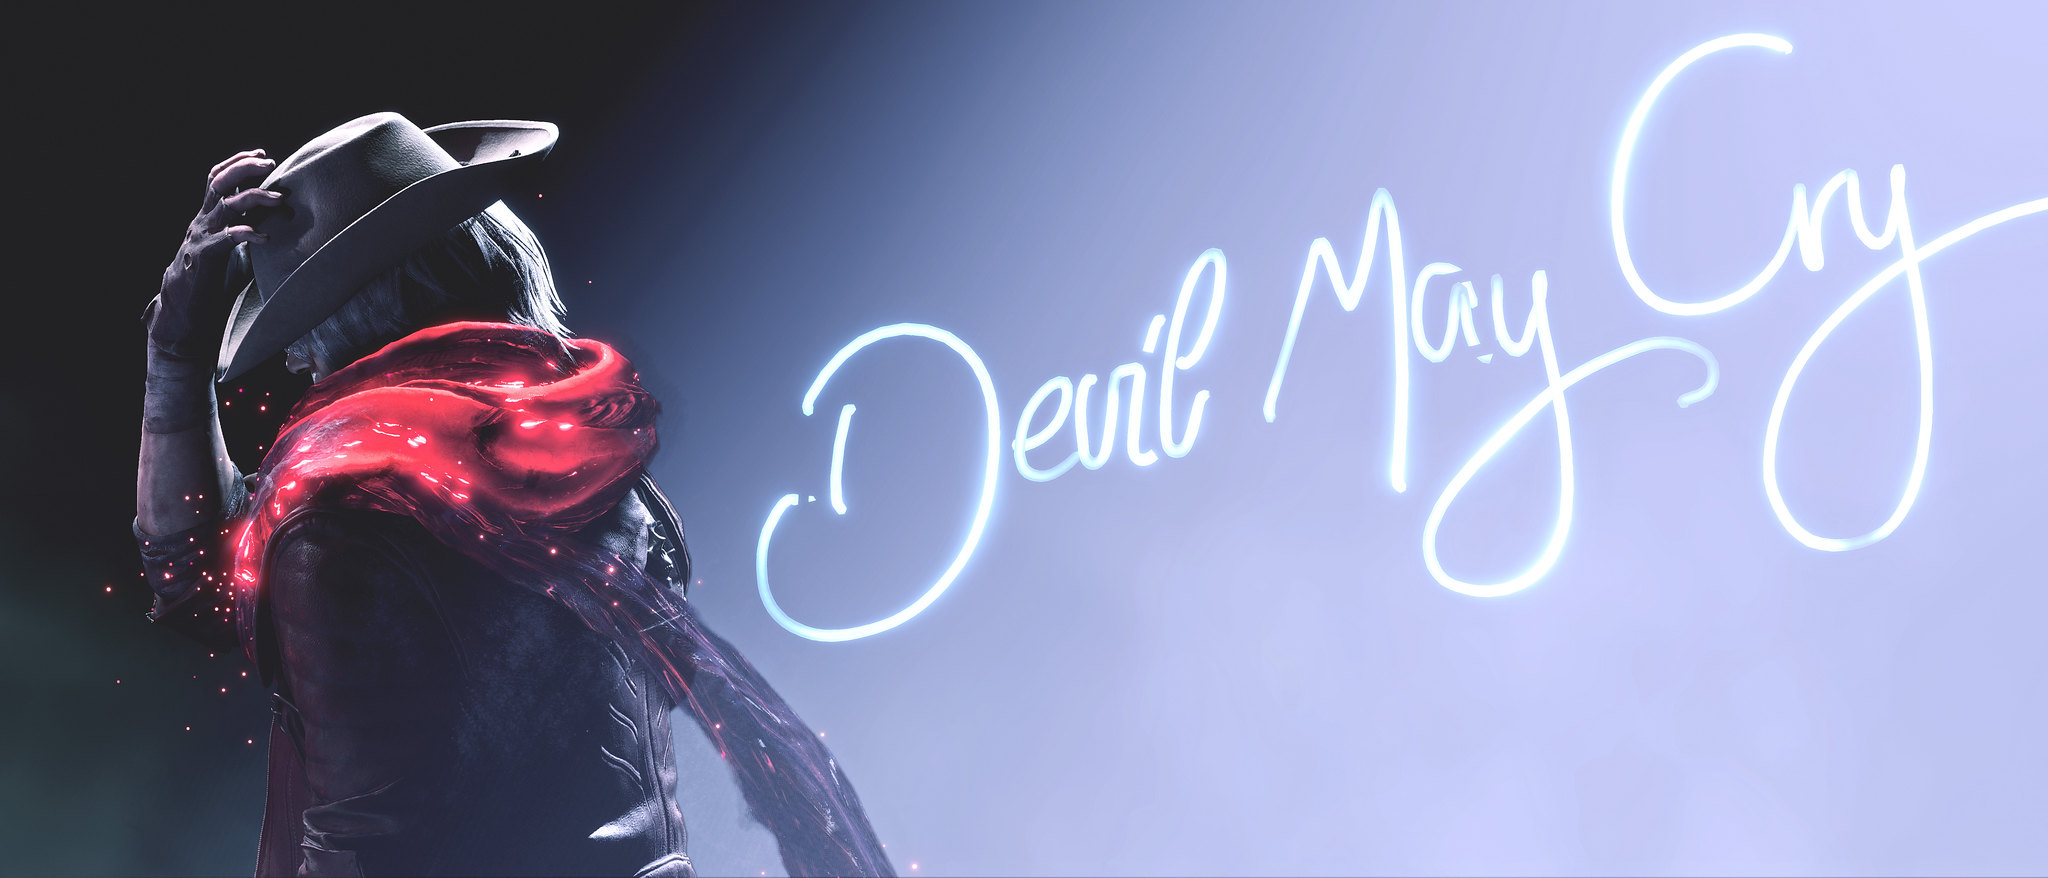 48378678616_4462bc92b5_k.jpg - Devil May Cry 5